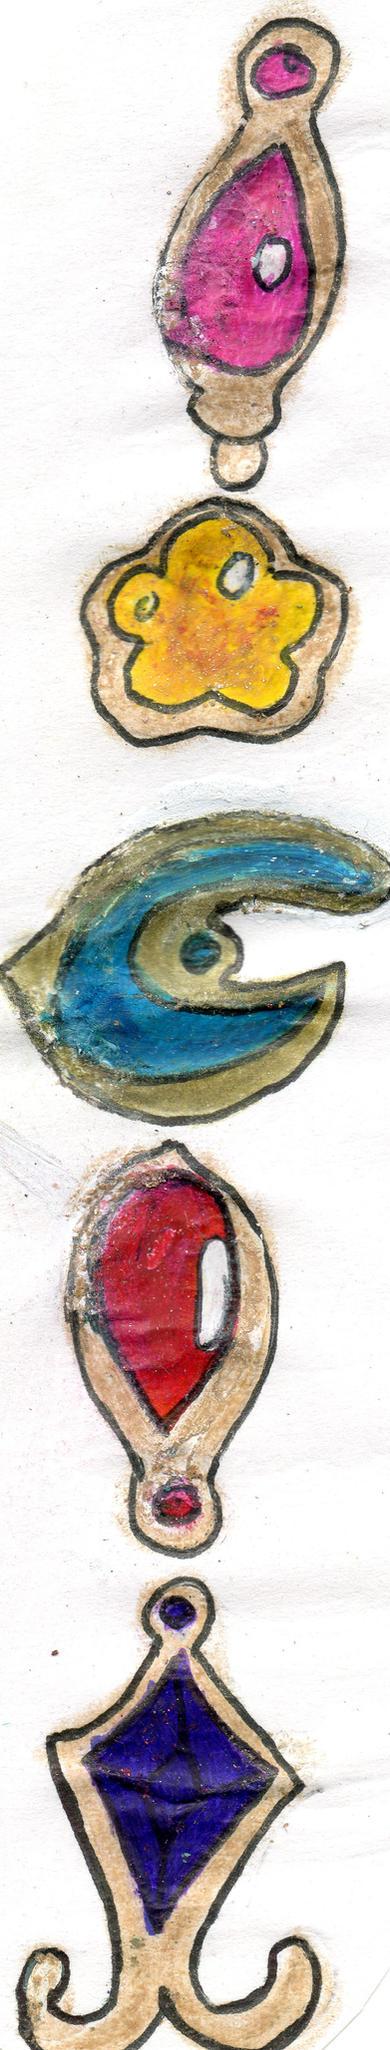 Puella Magi 5 Soul Gems emblems by YuiHarunaShinozaki